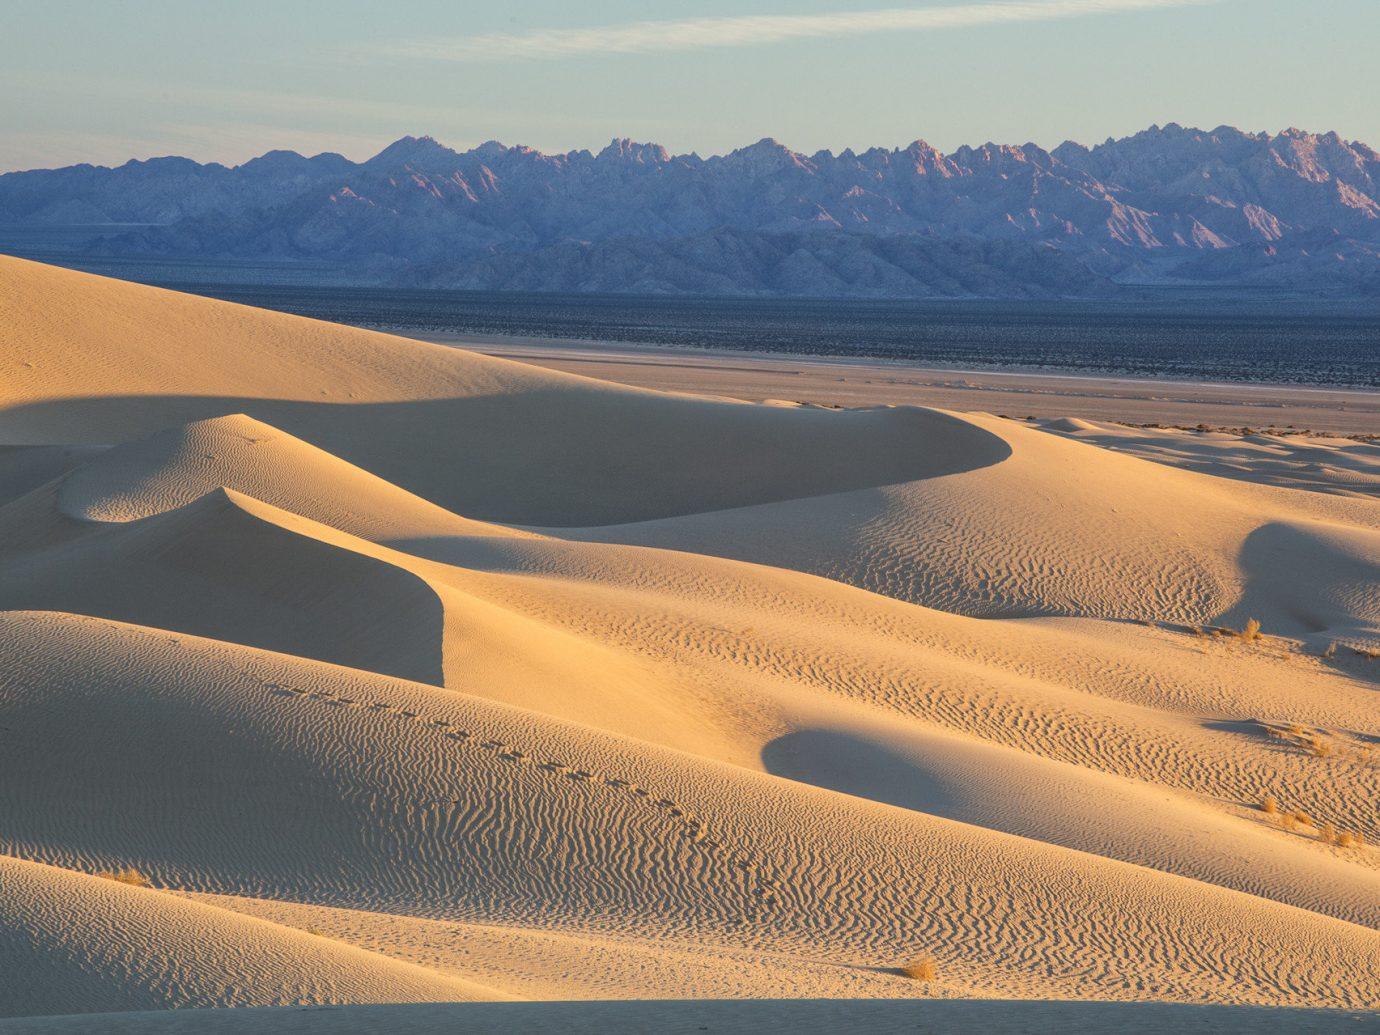 Sand dunes at Mojave National Preserve